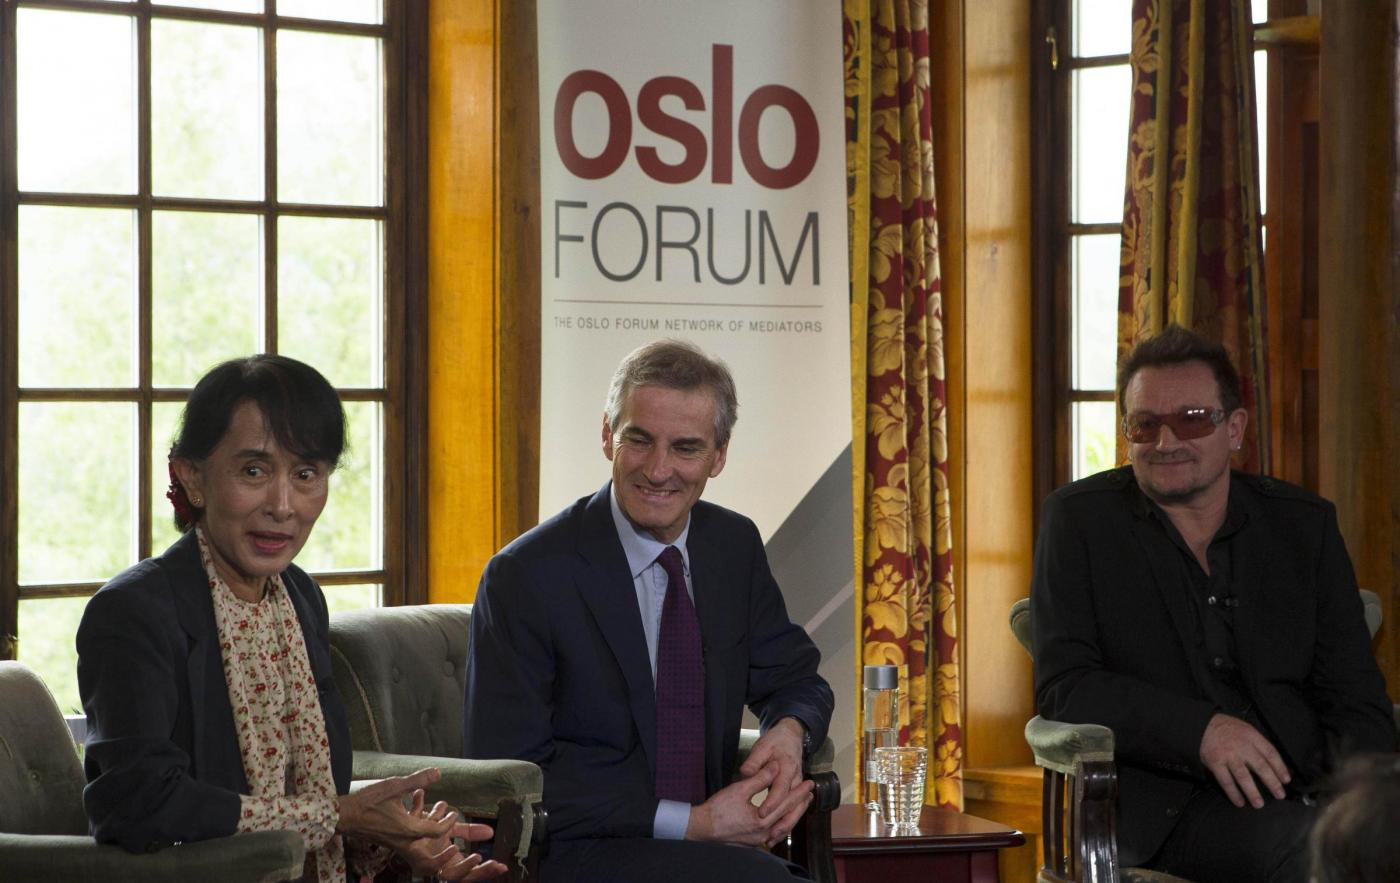 Oslo, Aung san Suu Kyi incontra la star degli U2 Bono08